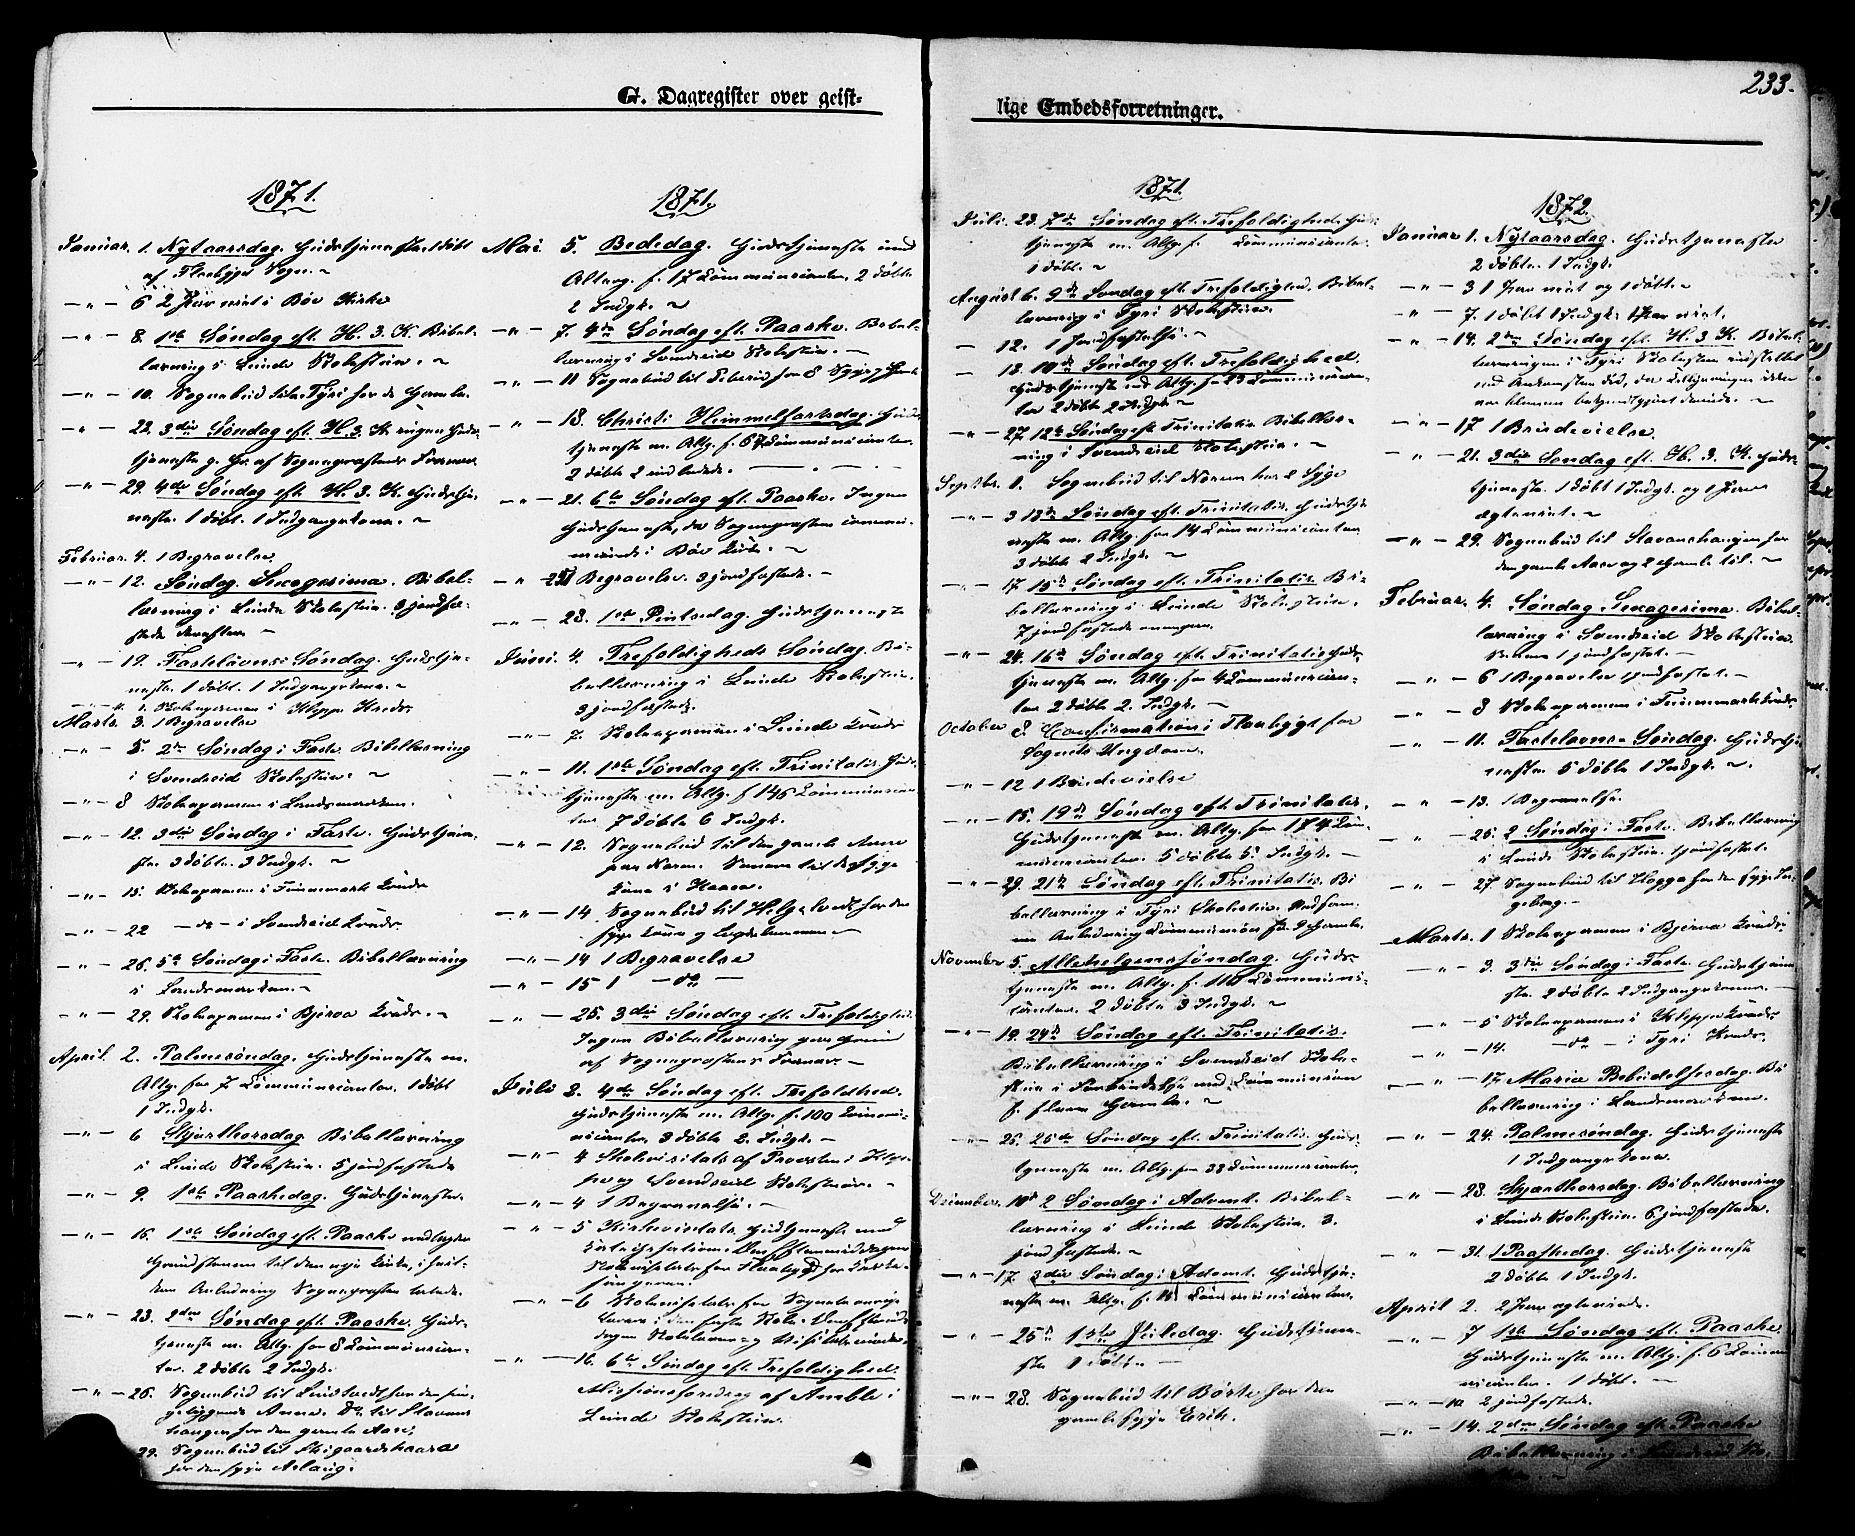 SAKO, Lunde kirkebøker, F/Fa/L0001: Ministerialbok nr. I 1, 1866-1883, s. 233